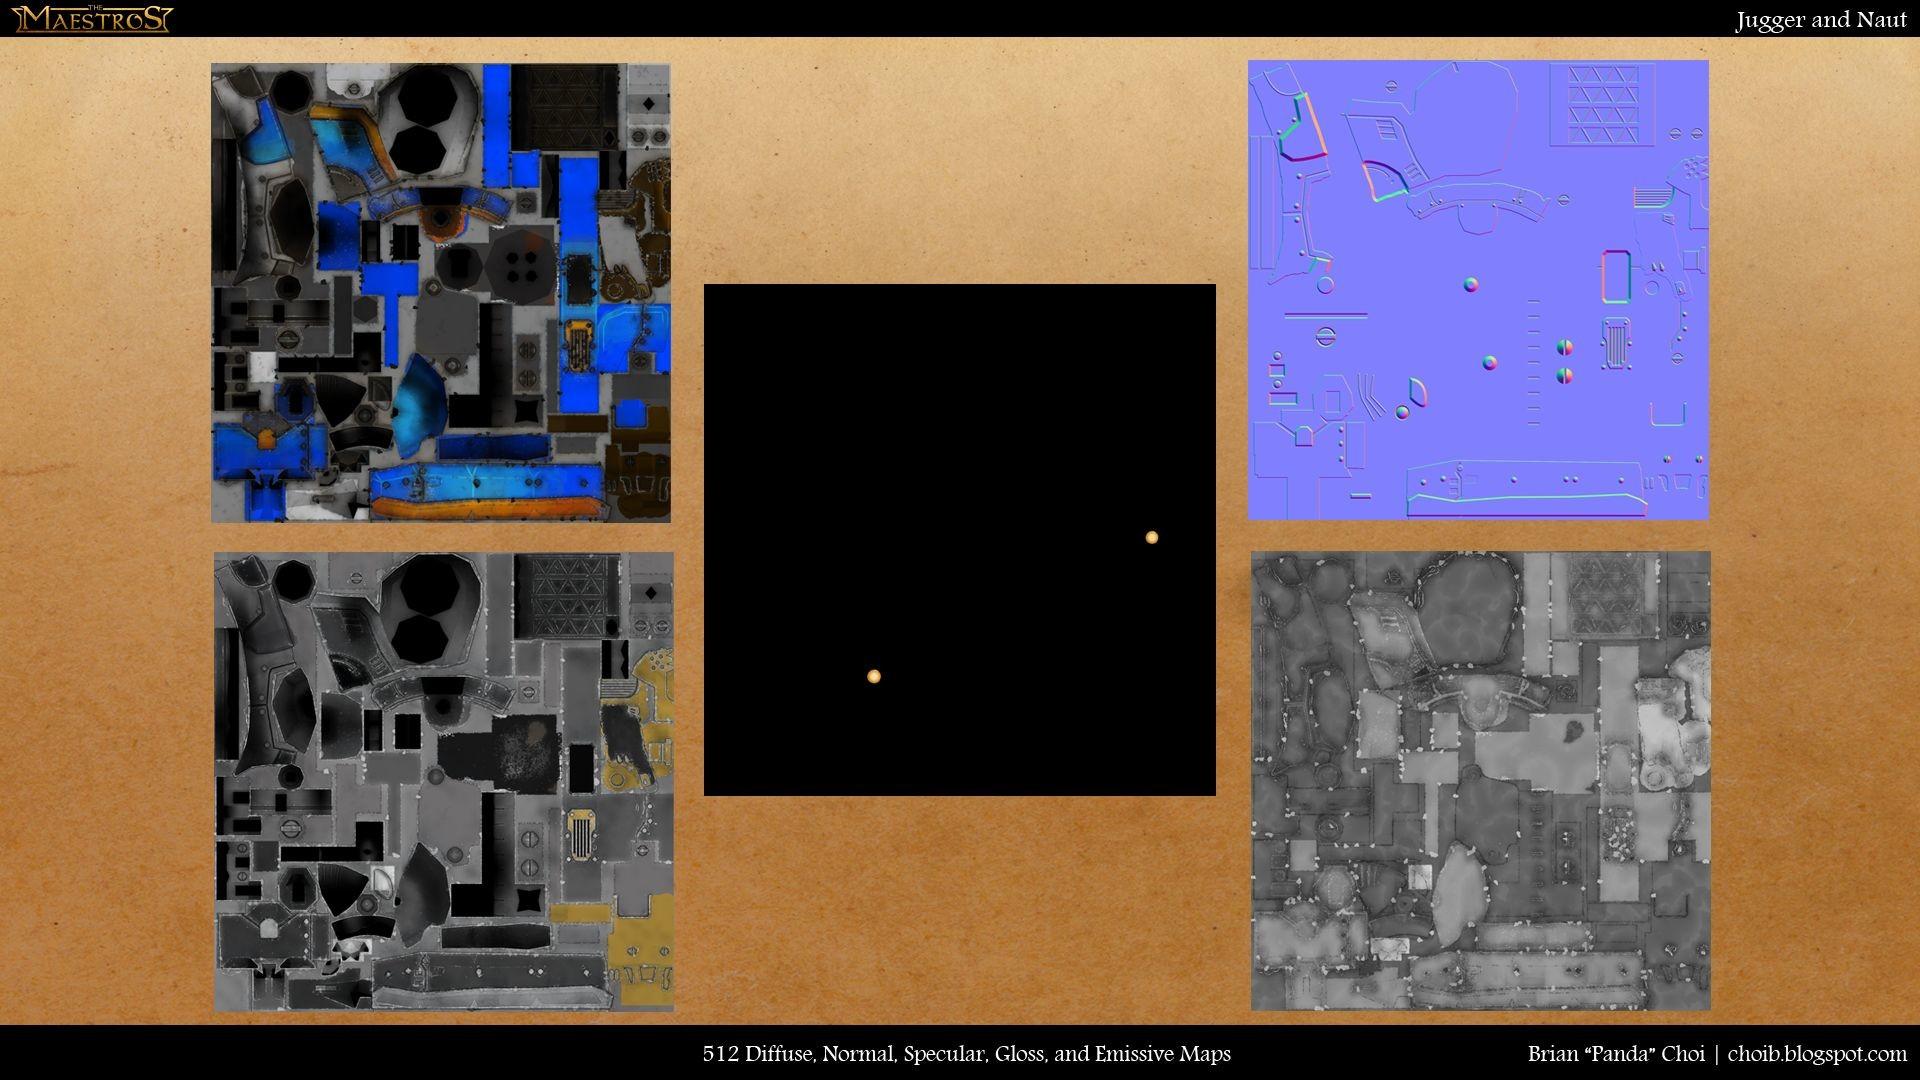 Brian panda choi juggerandnaut texturemaps